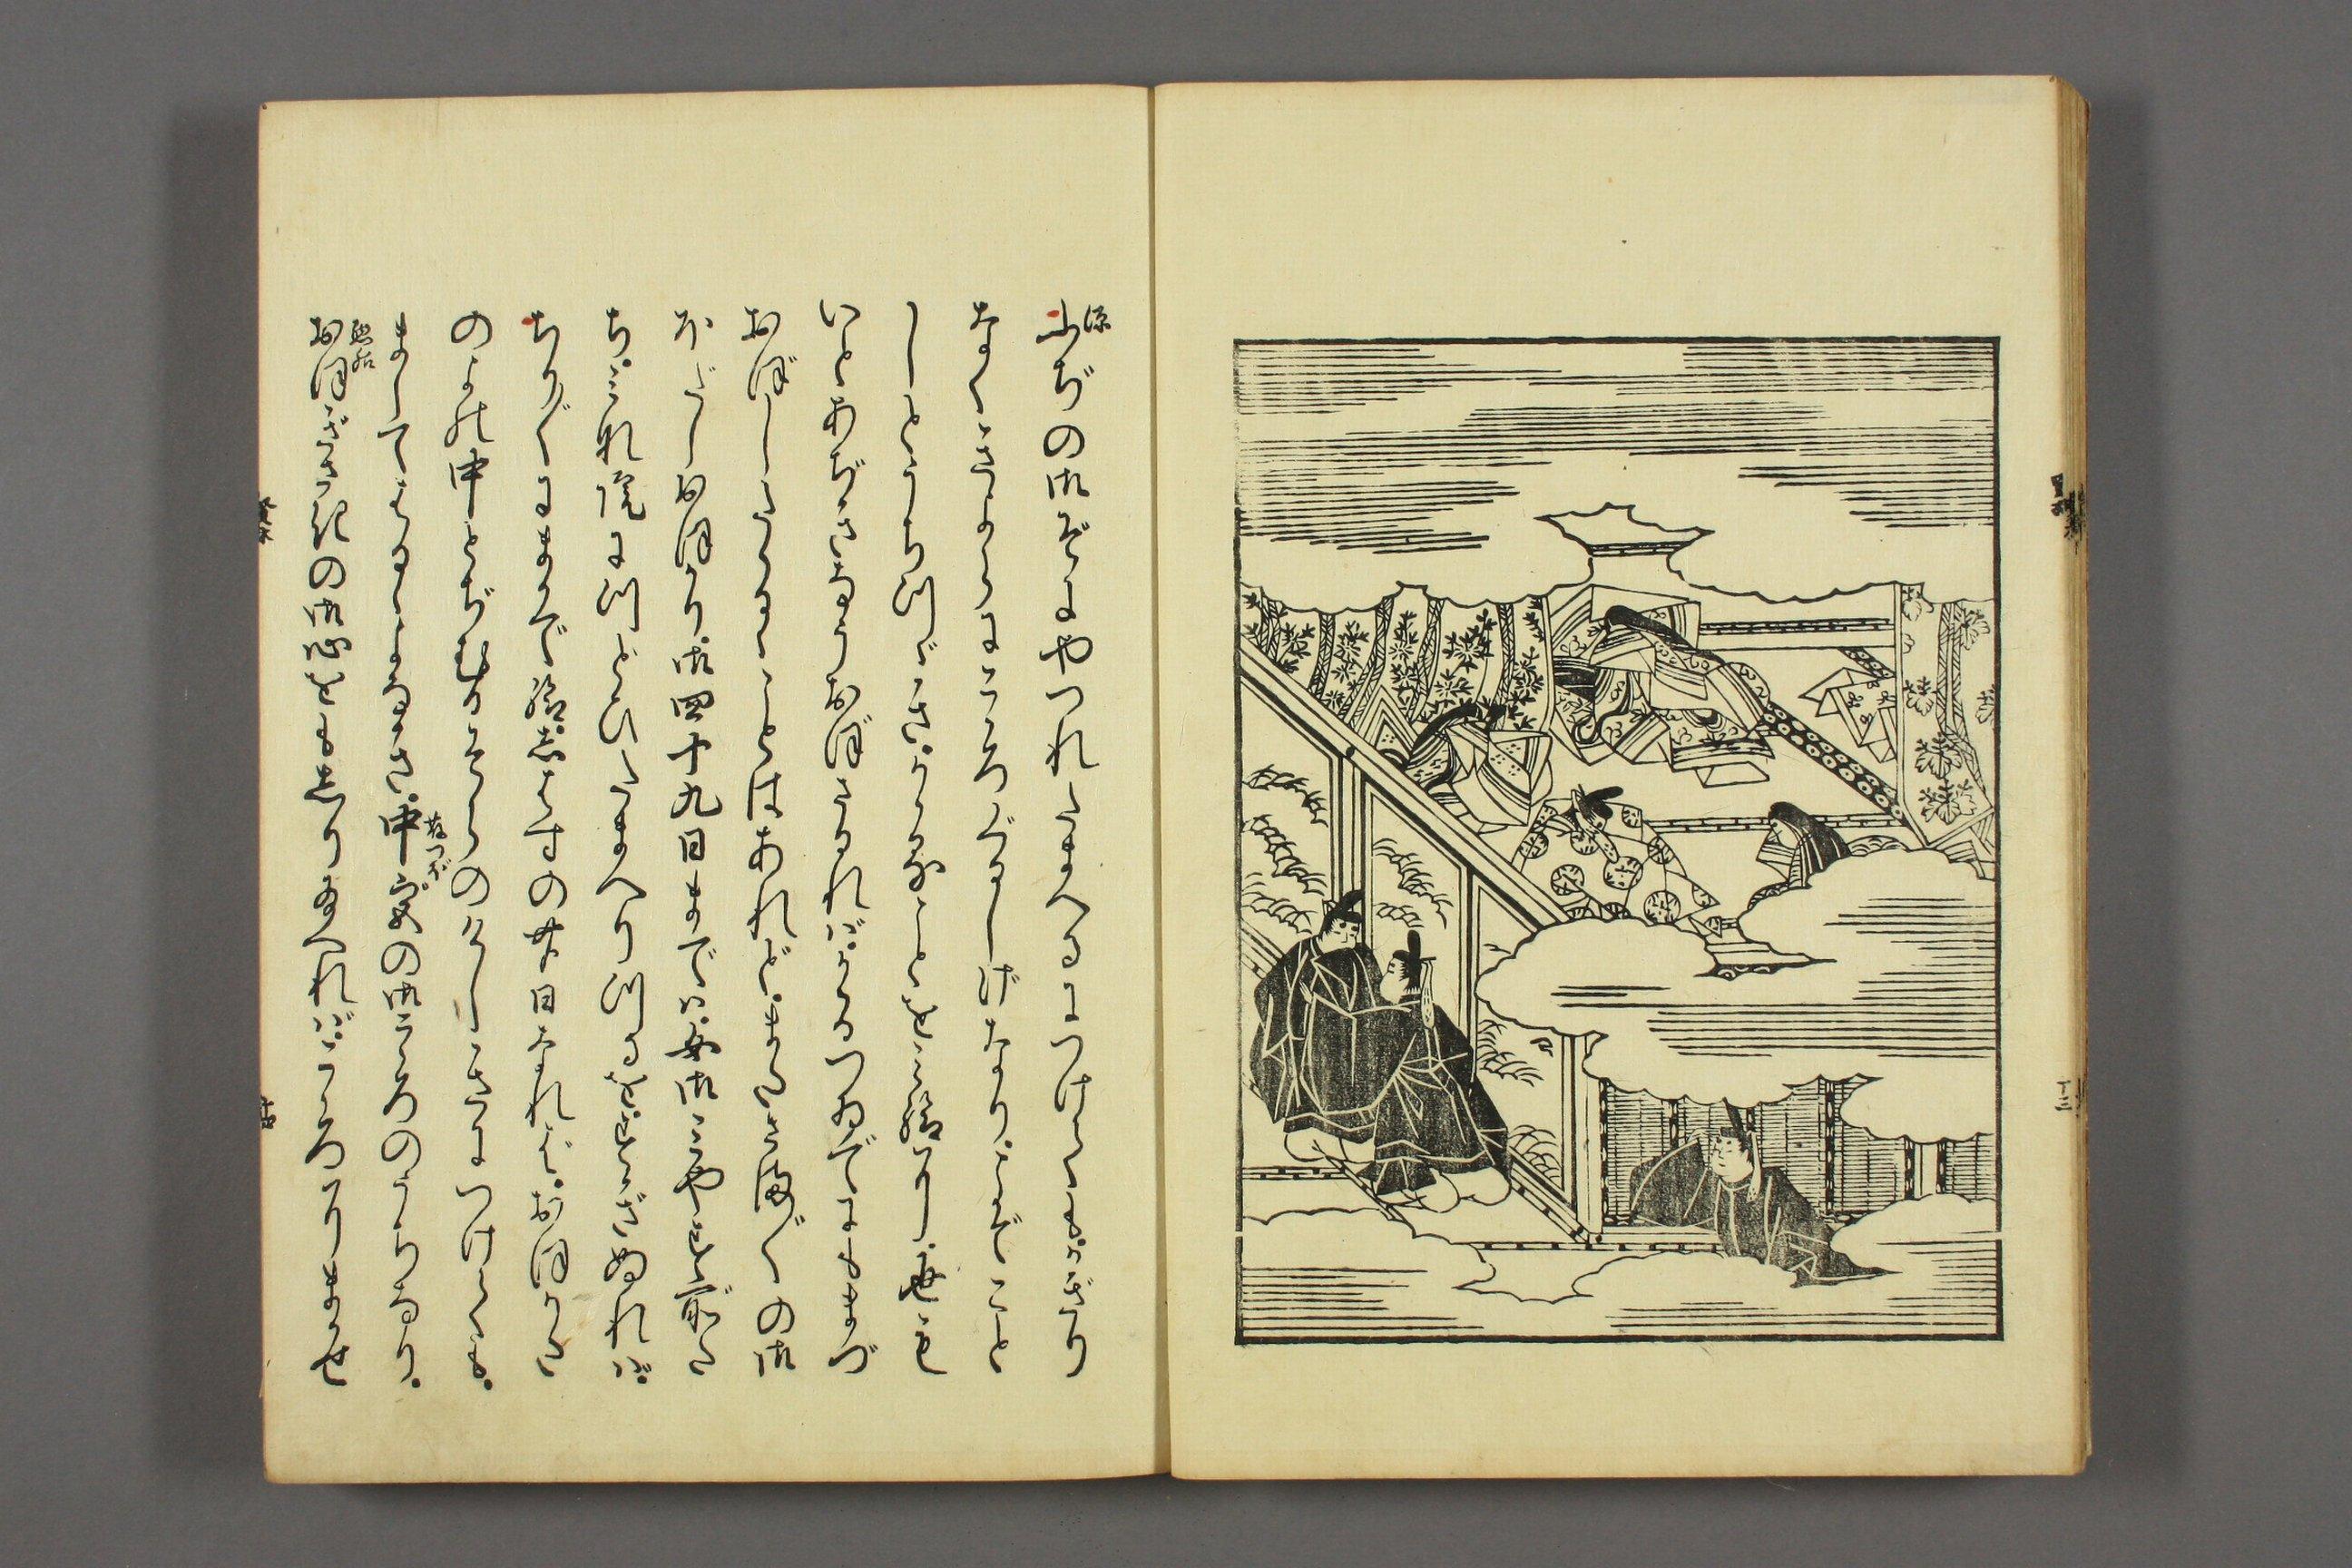 http://archive.wul.waseda.ac.jp/kosho/bunko30/bunko30_a0007/bunko30_a0007_0010/bunko30_a0007_0010_p0015.jpg